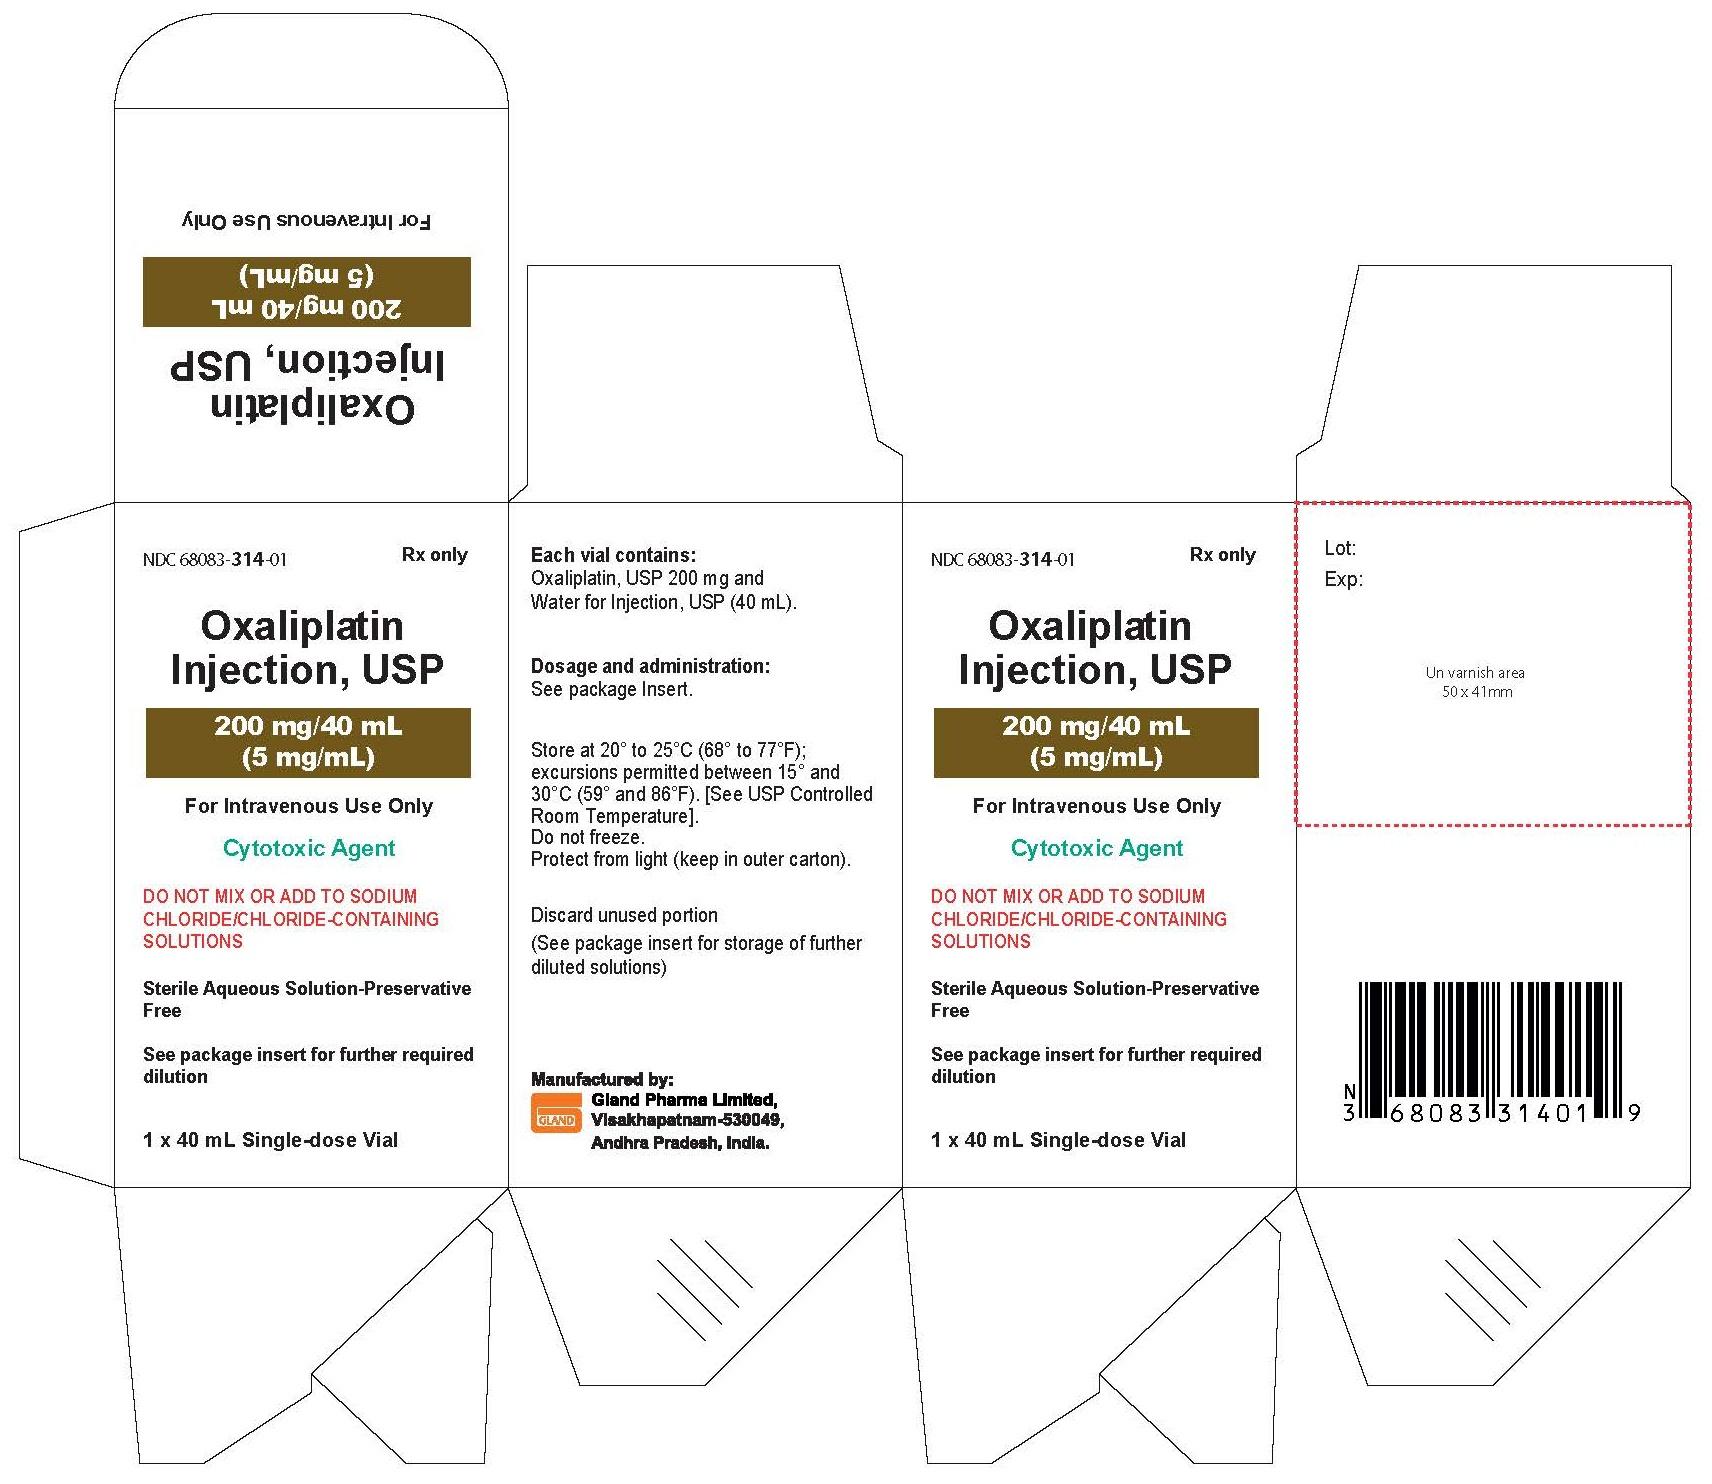 Oxaliplatin-40mL-Carton-label.jpg